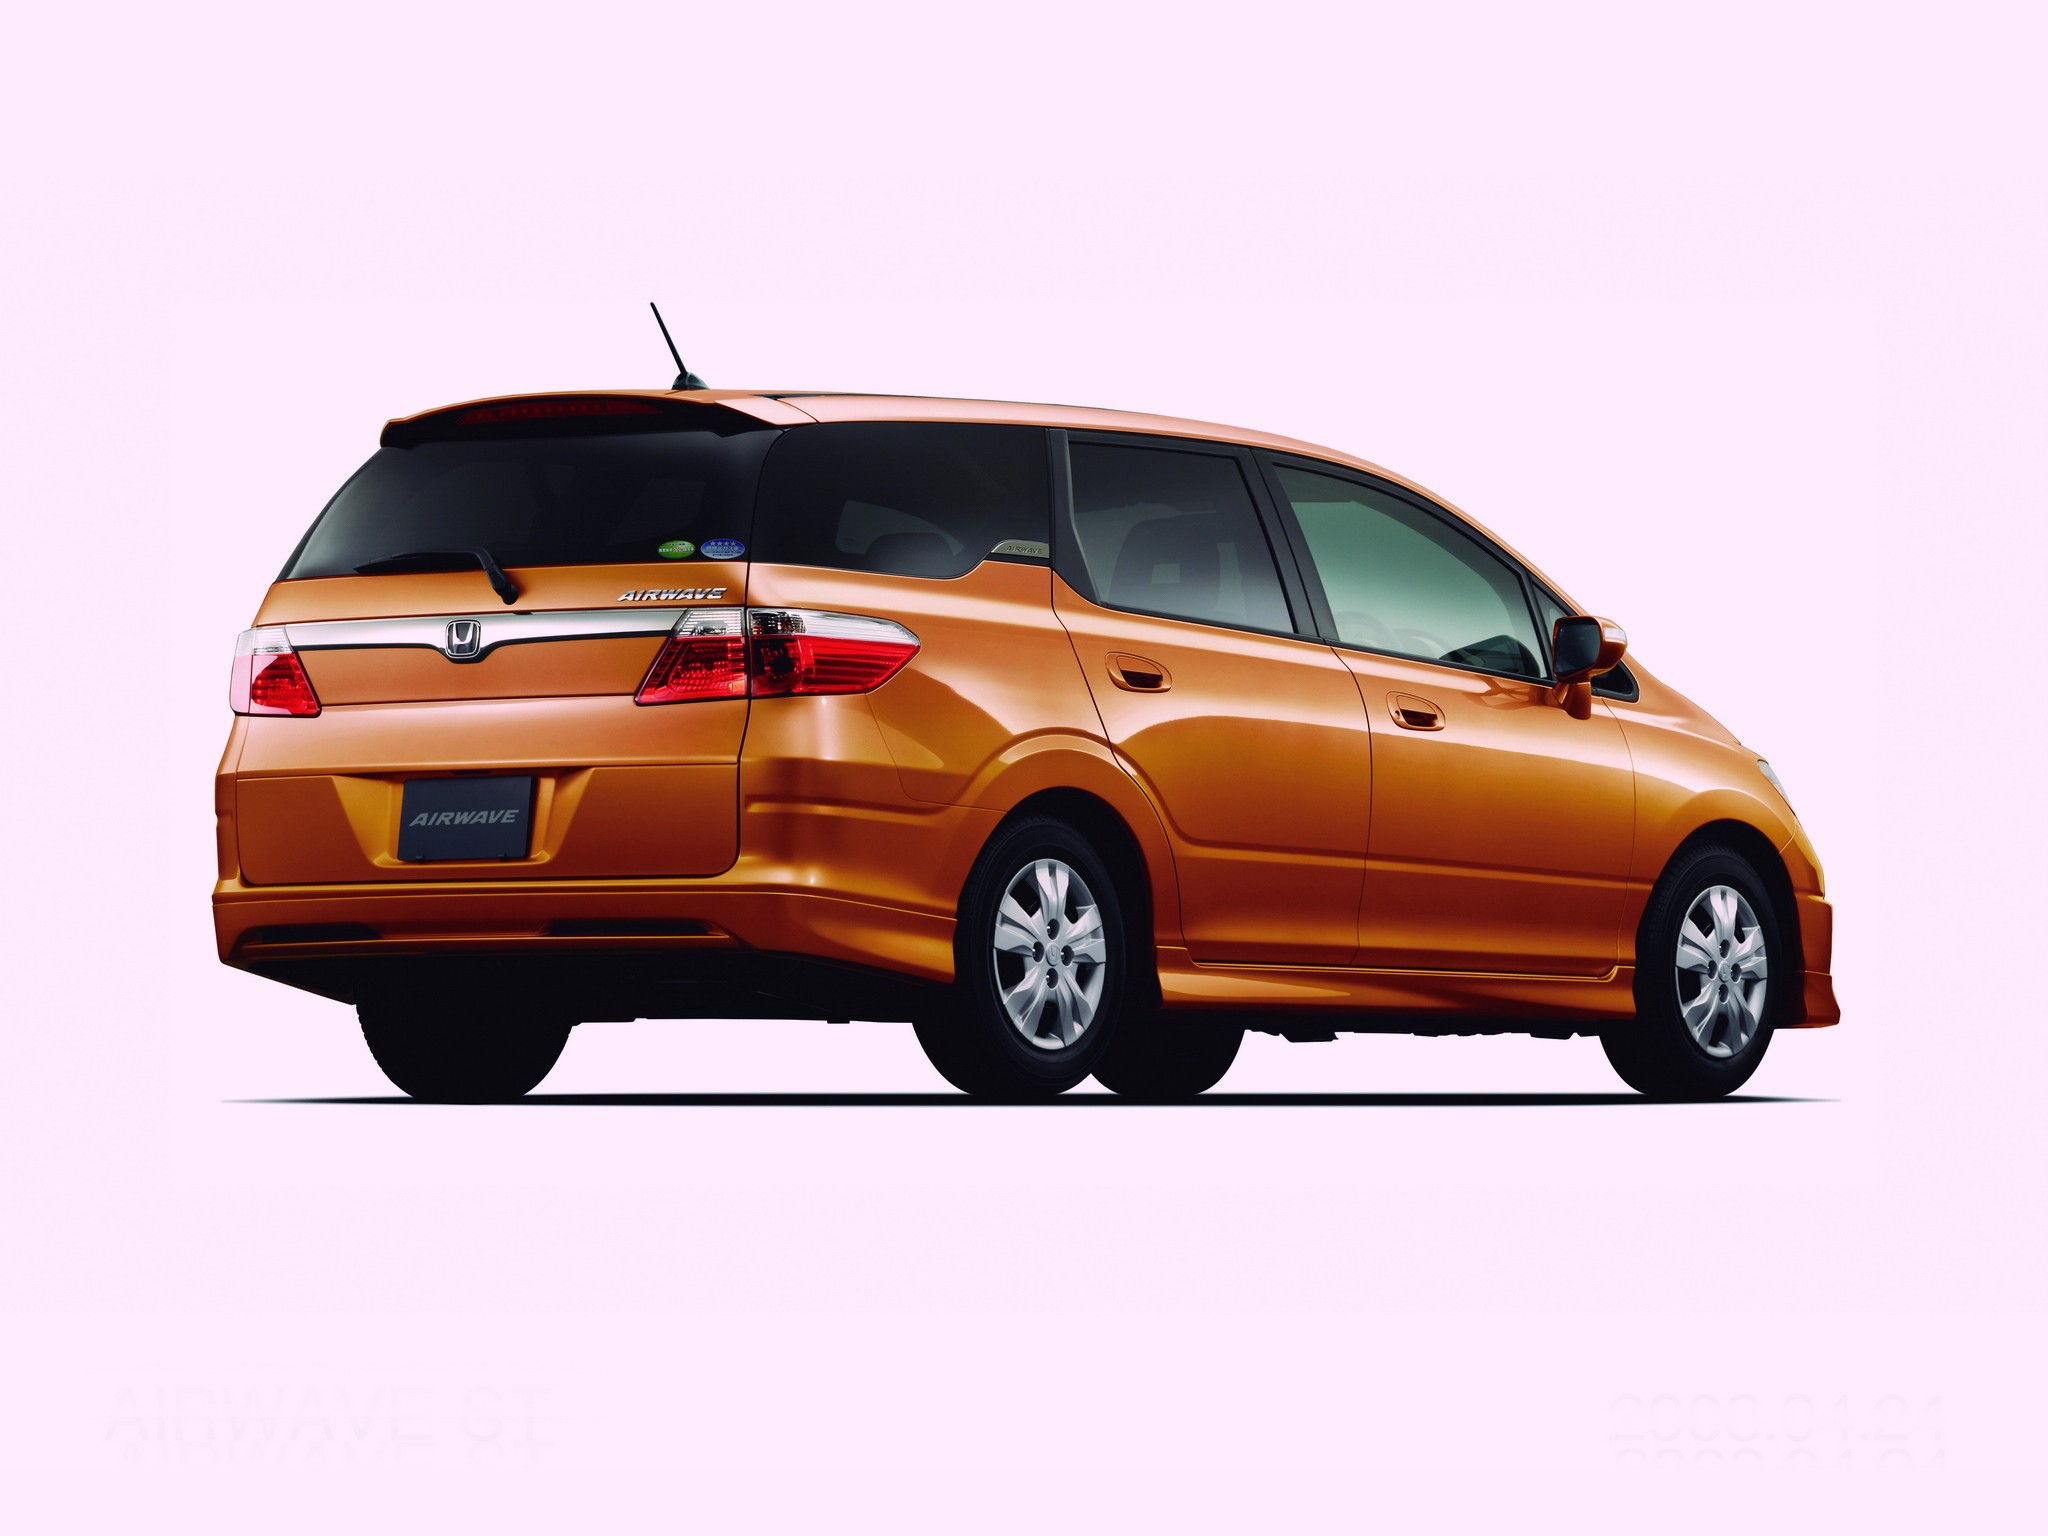 Civic Type R Awd >> HONDA Airwave specs & photos - 2005, 2006, 2007, 2008, 2009, 2010 - autoevolution